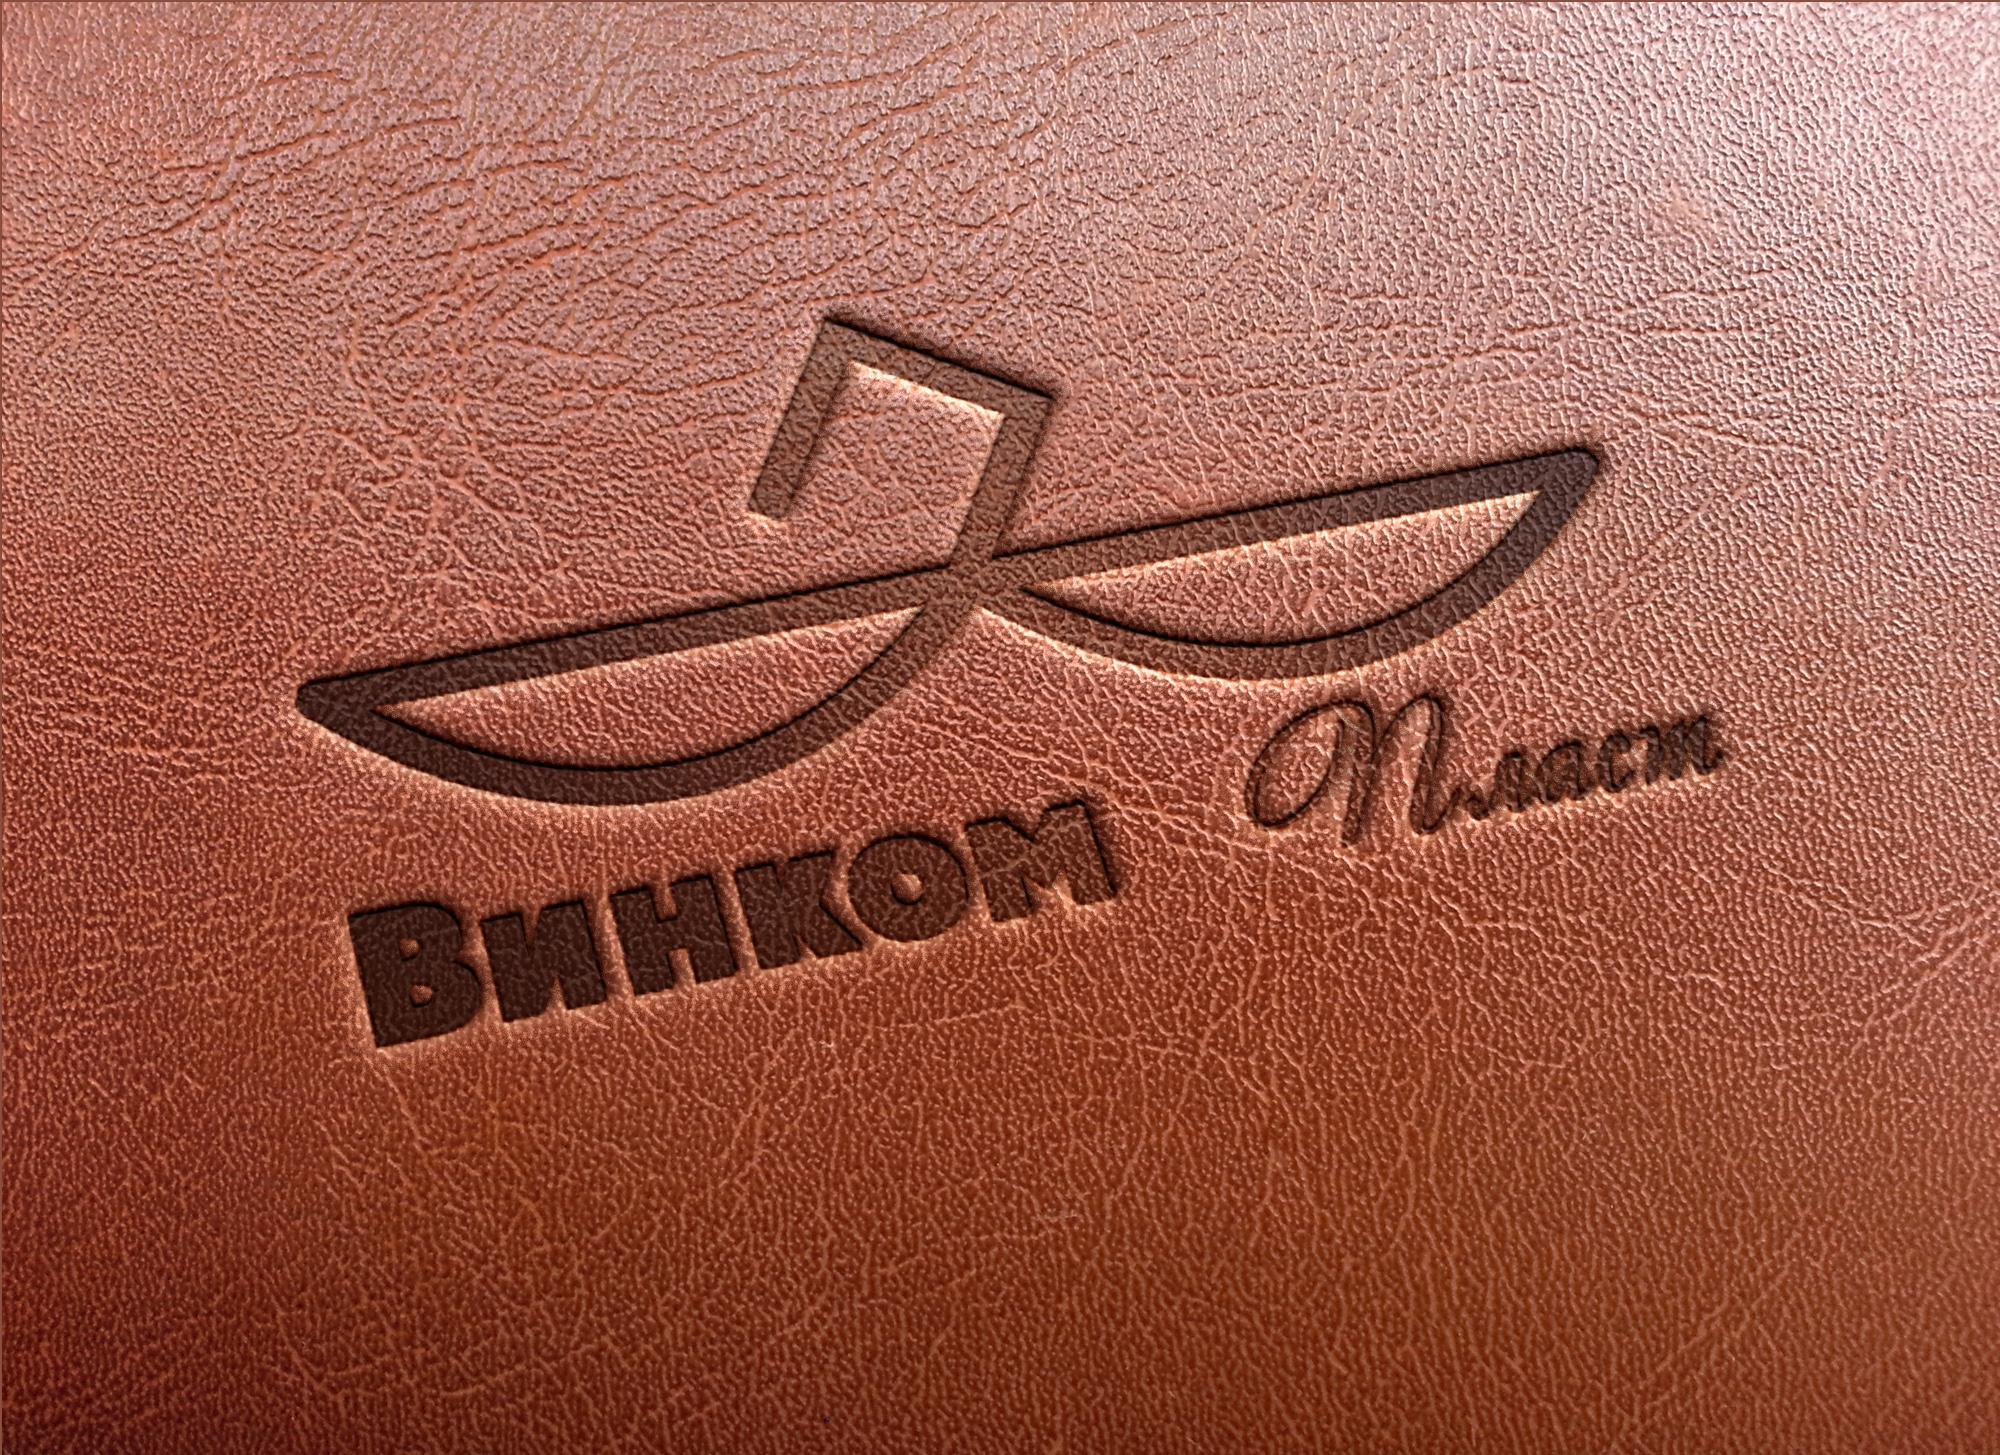 Логотип, фавикон и визитка для компании Винком Пласт  фото f_6025c40d9c75efc9.jpg